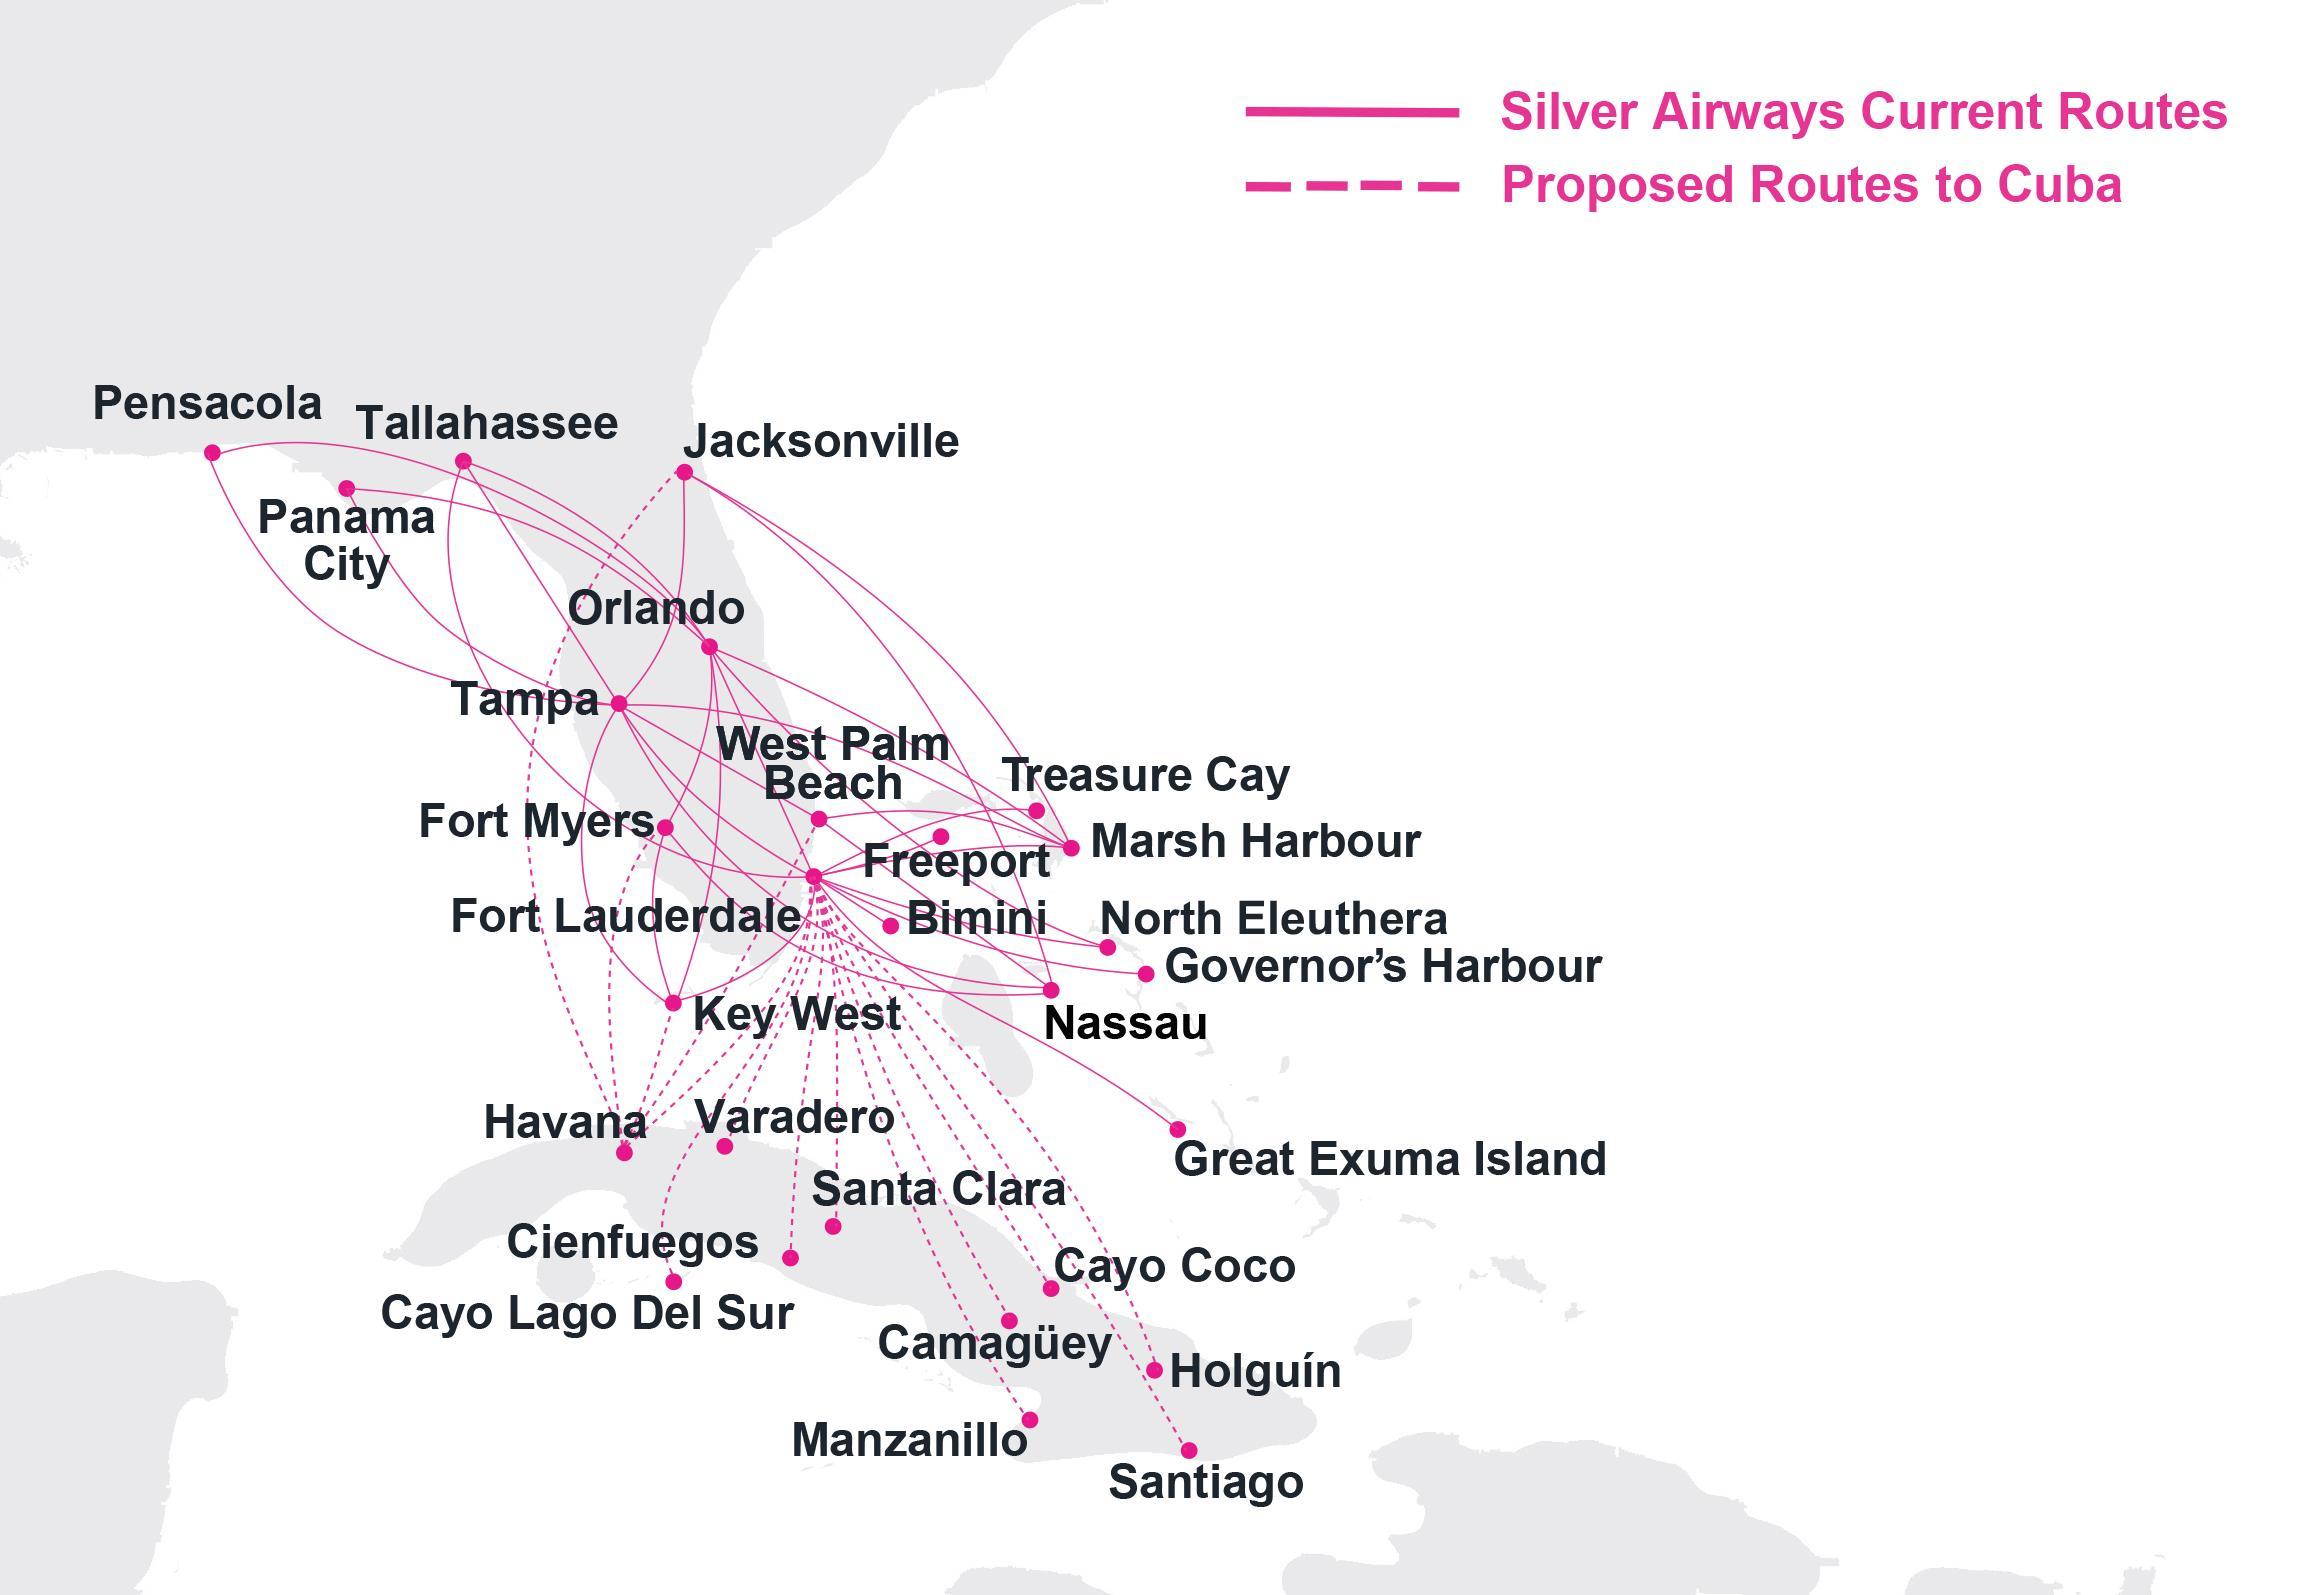 US airlines vie for Cuba flights; Havana top destination